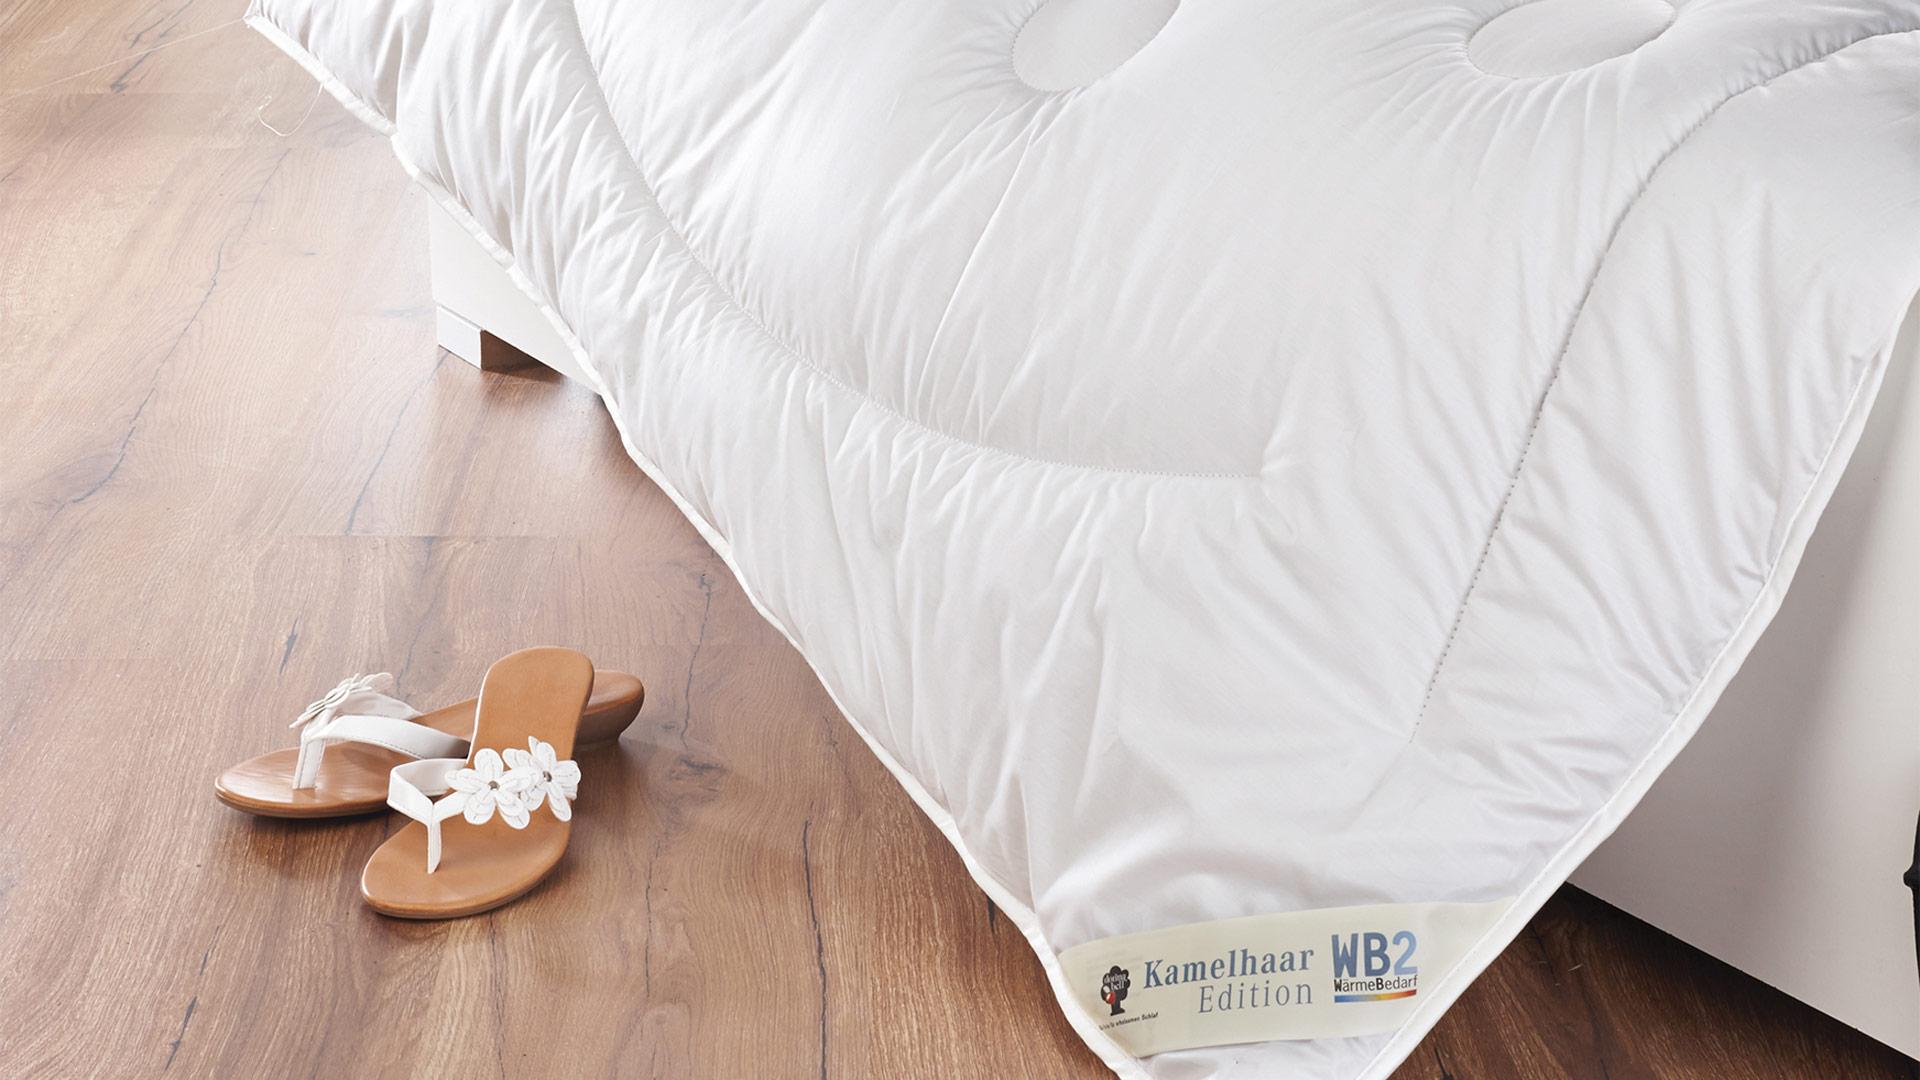 kopfkissen beratung feng shui farben schlafzimmer bettw sche 220x240 cm ikea hacks kariert grau. Black Bedroom Furniture Sets. Home Design Ideas